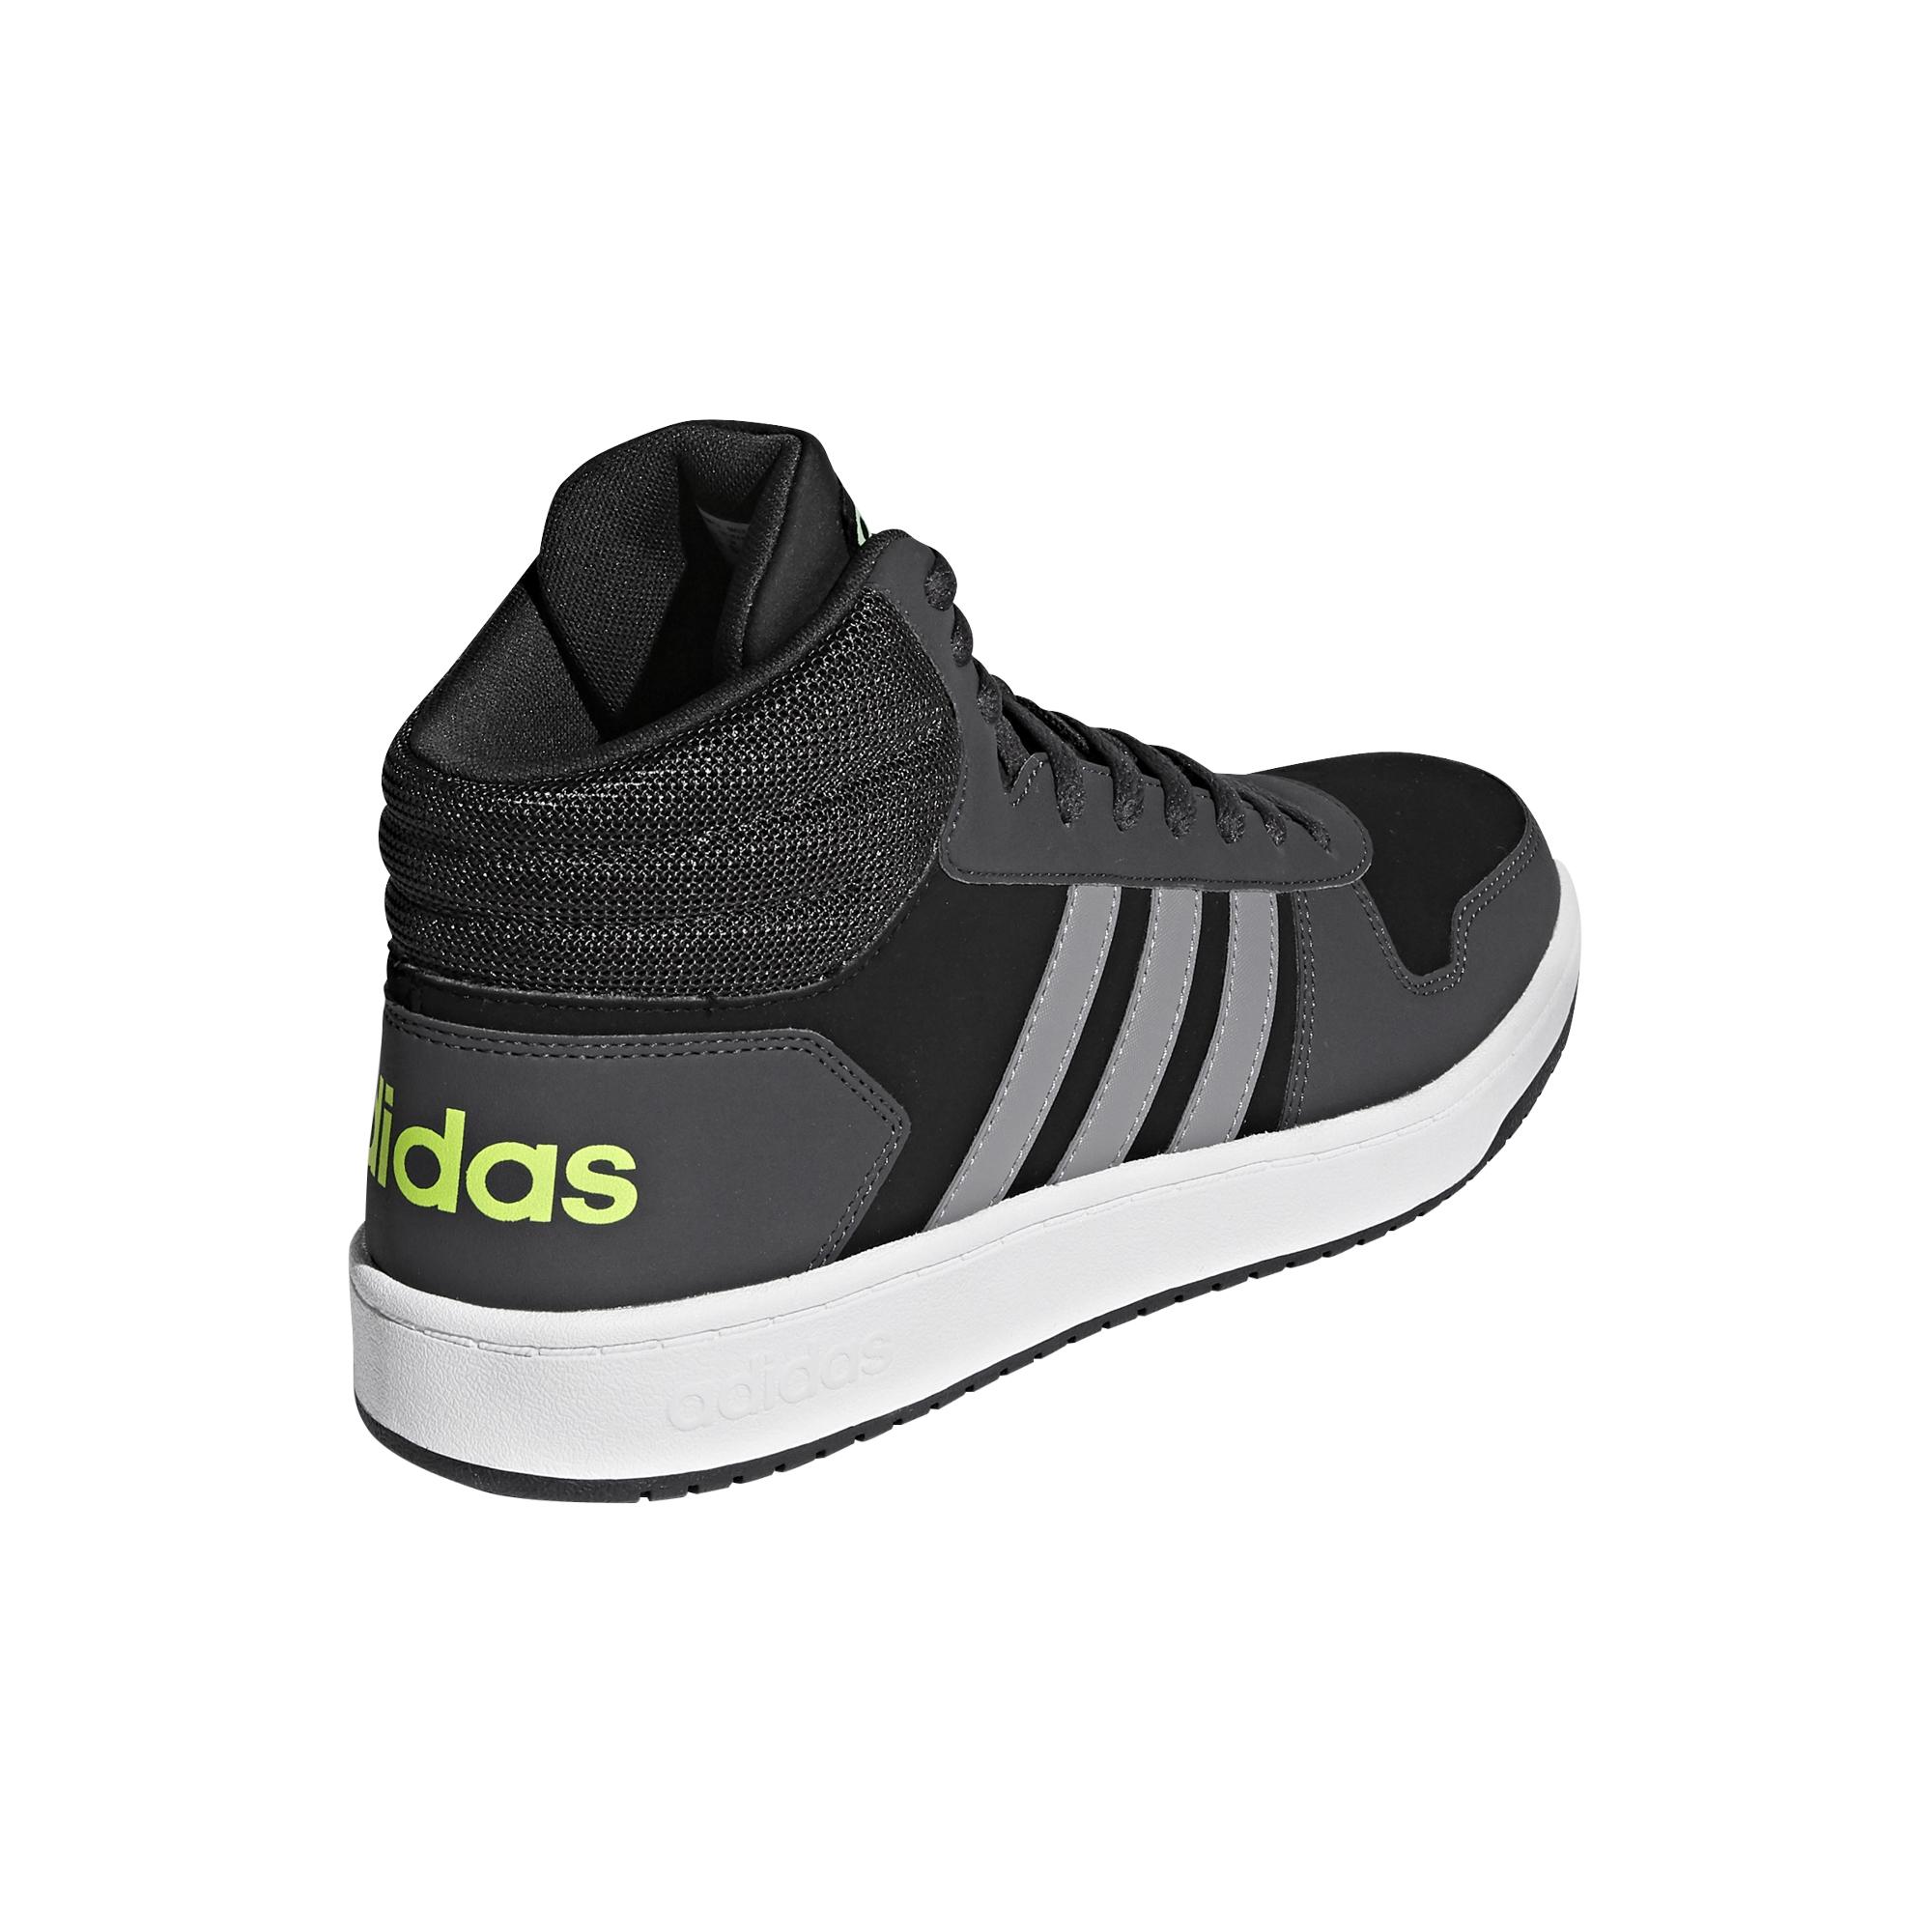 adidas VS Hoops Mid 2.0 DB0099